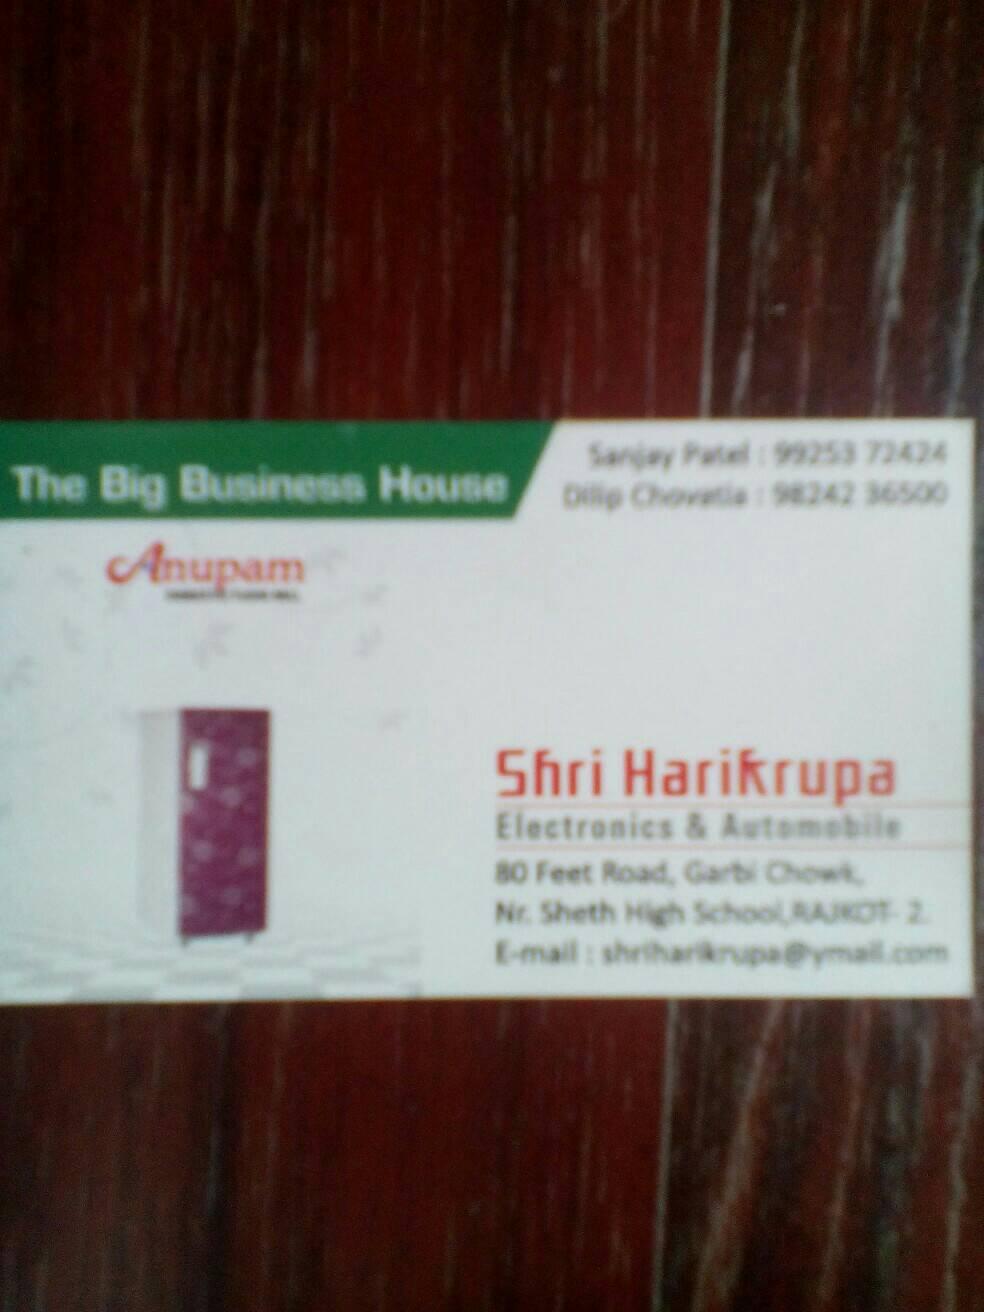 Shri Harikrupa Electronics & Automobile